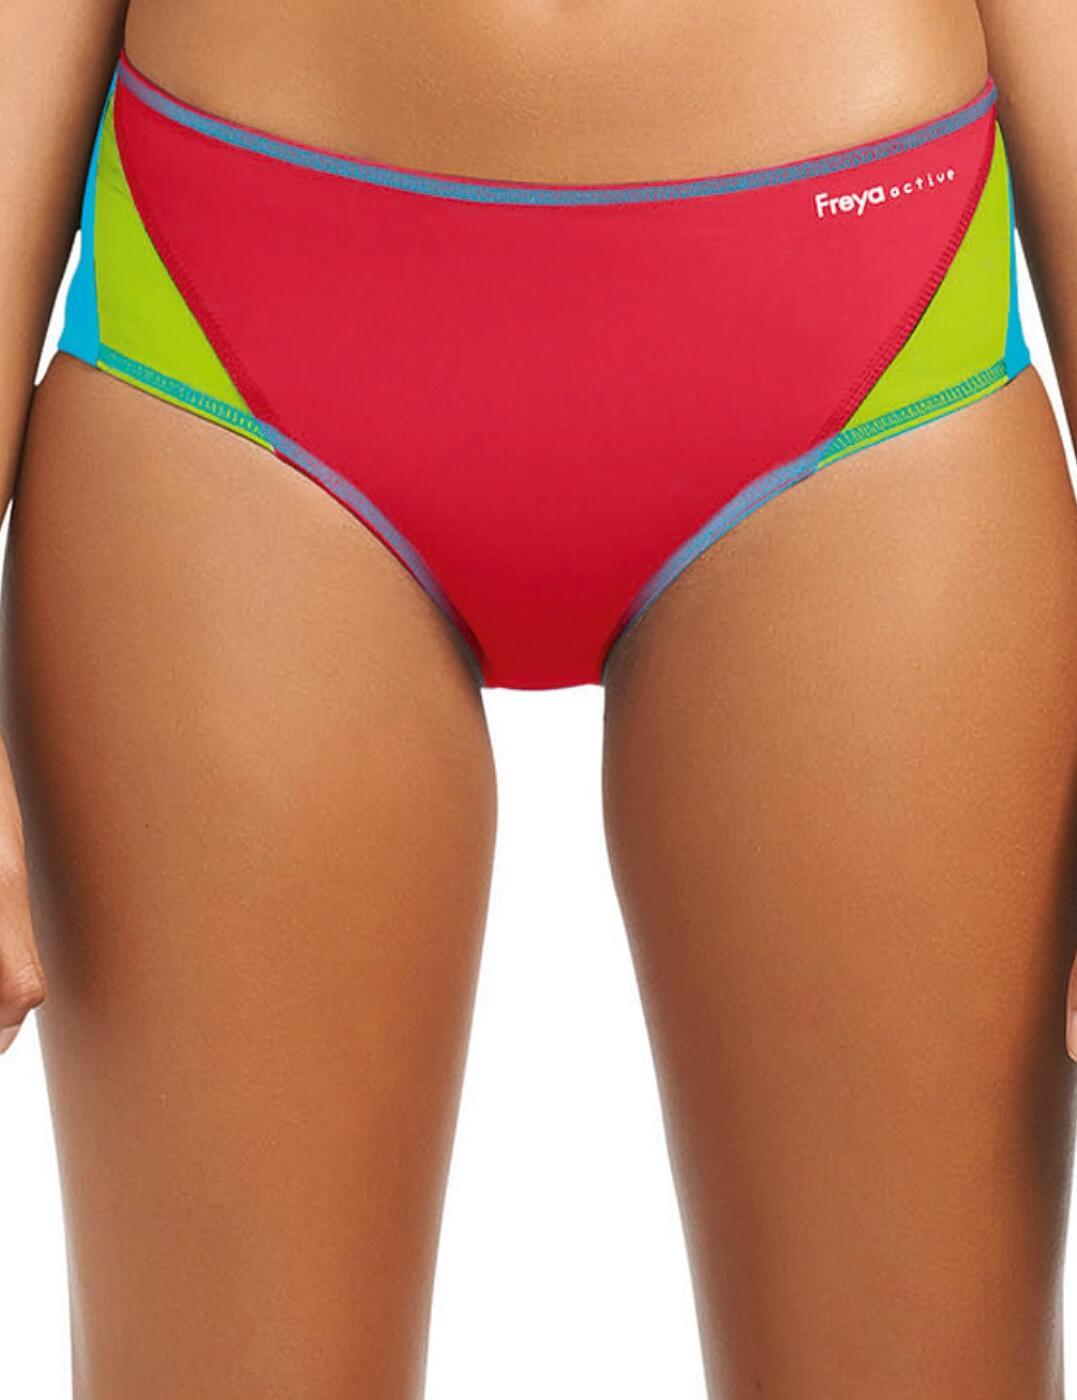 3993 Freya Active Swim Classic Bikini Brief - 3993 Jellybean